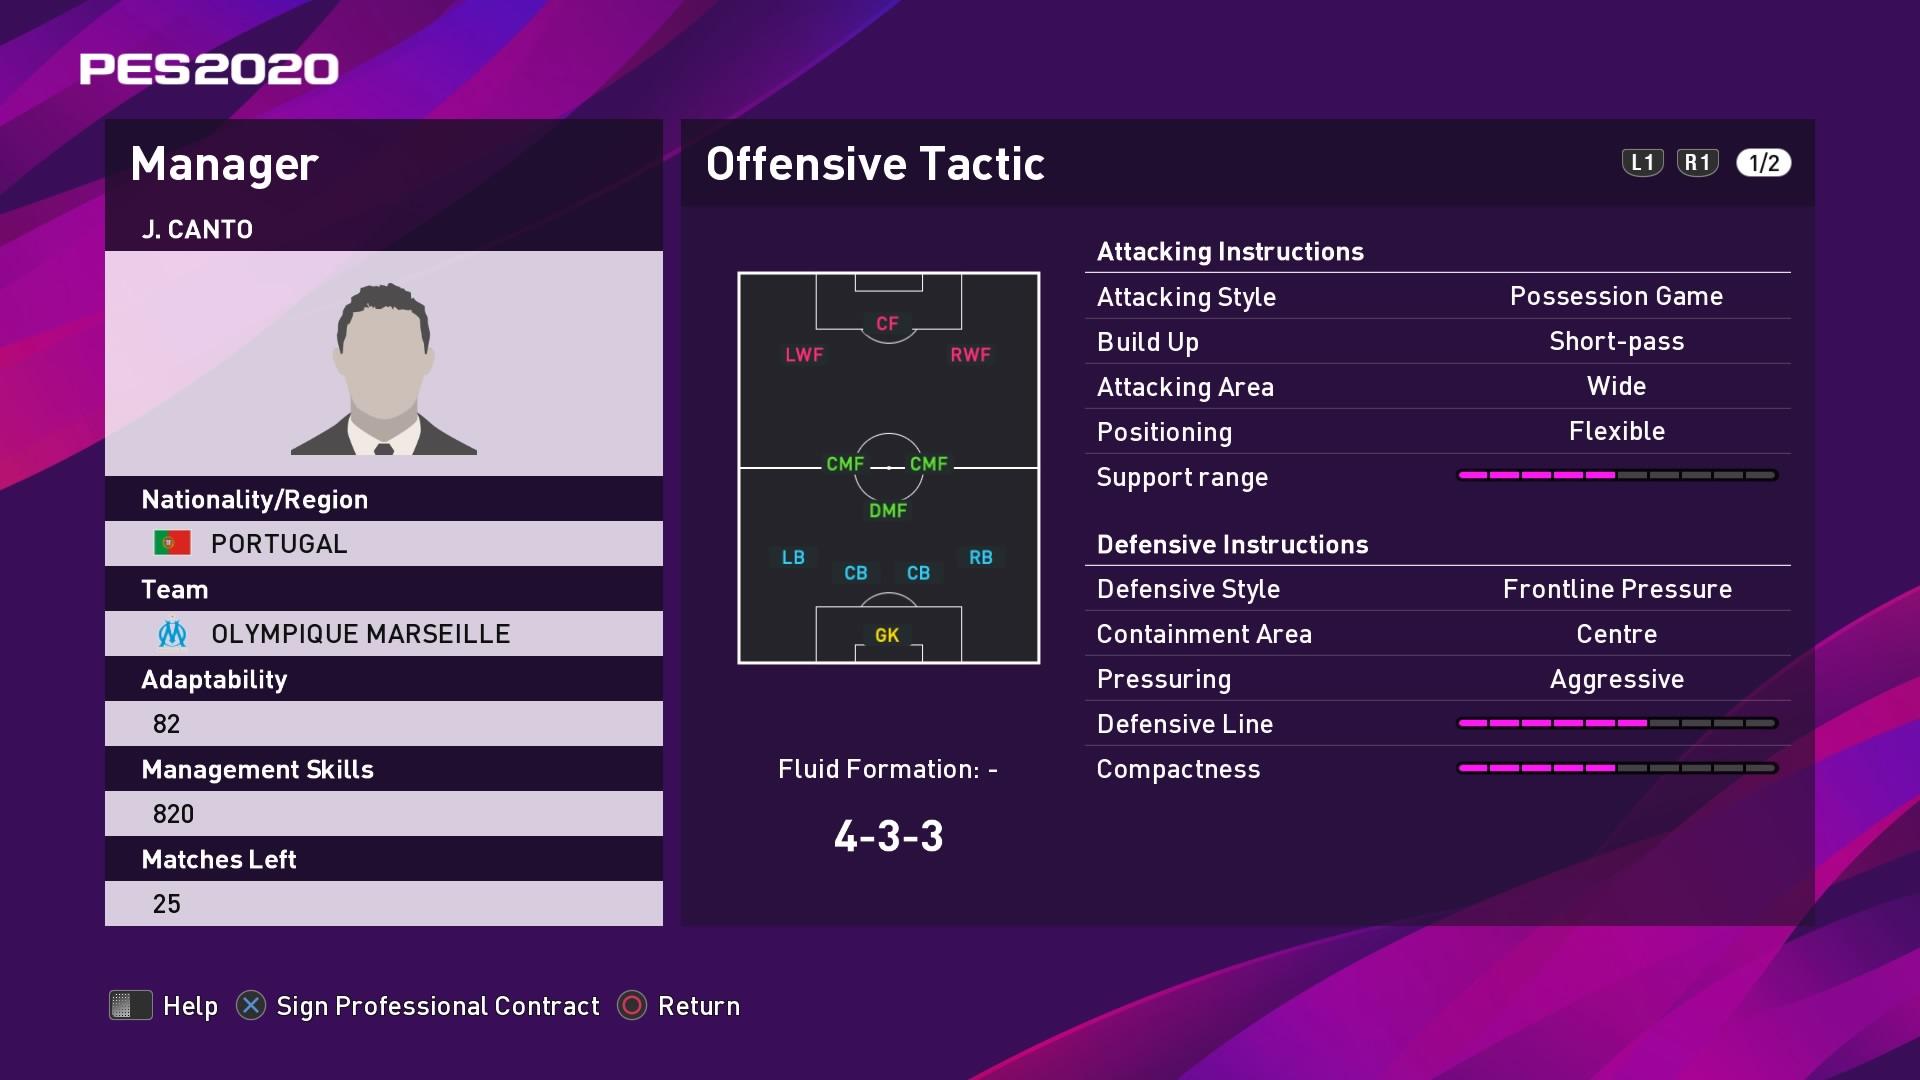 J. Canto (André Villas-Boas) Offensive Tactic in PES 2020 myClub